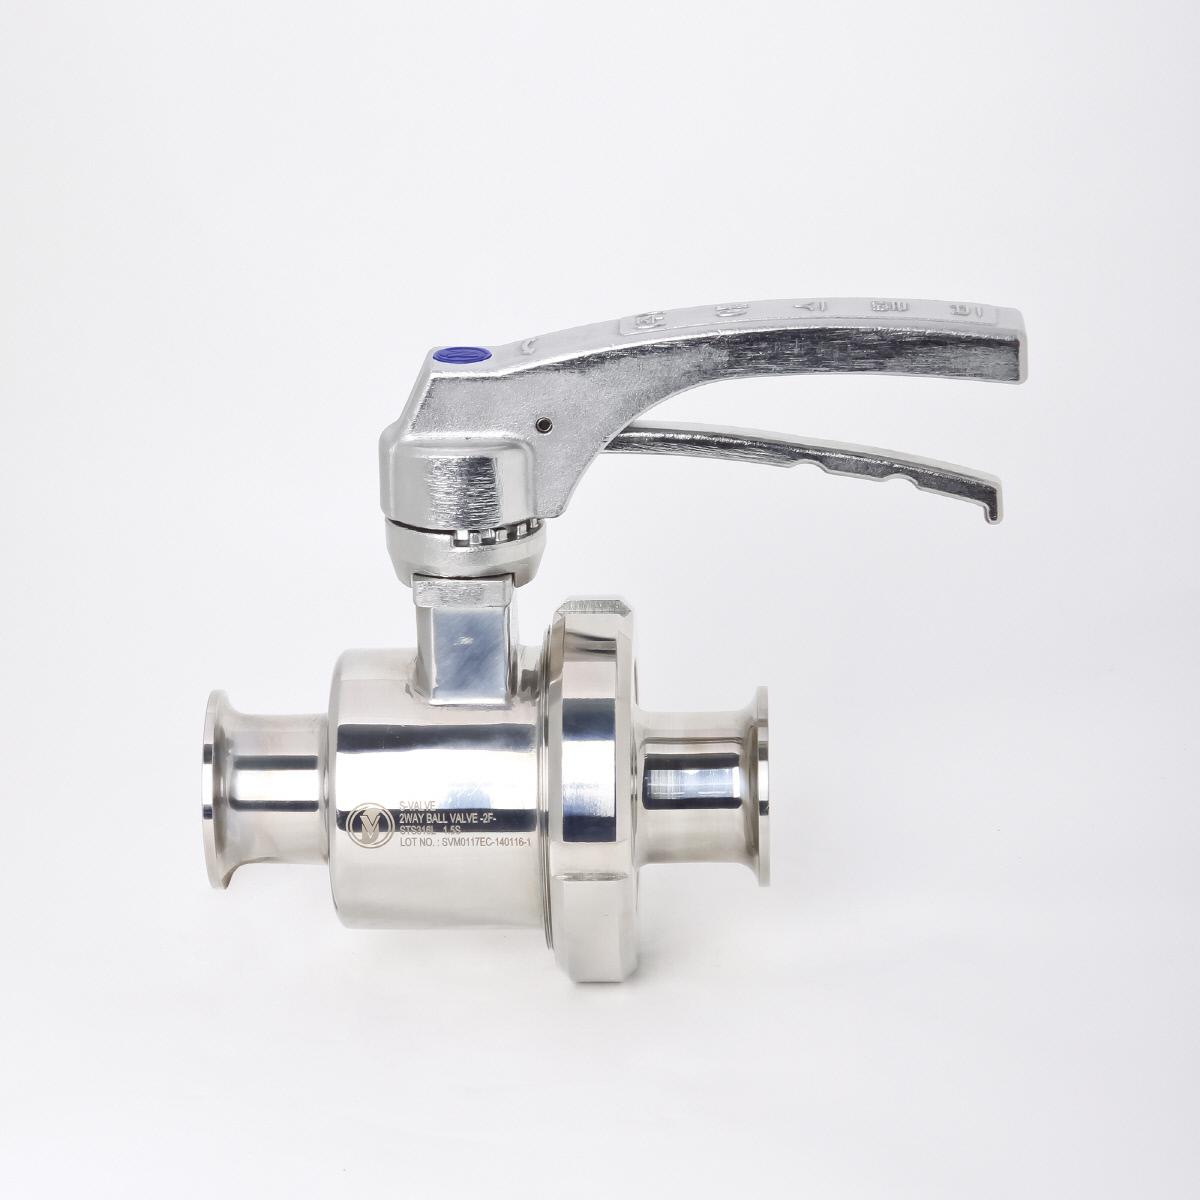 S-valve_0078.jpg